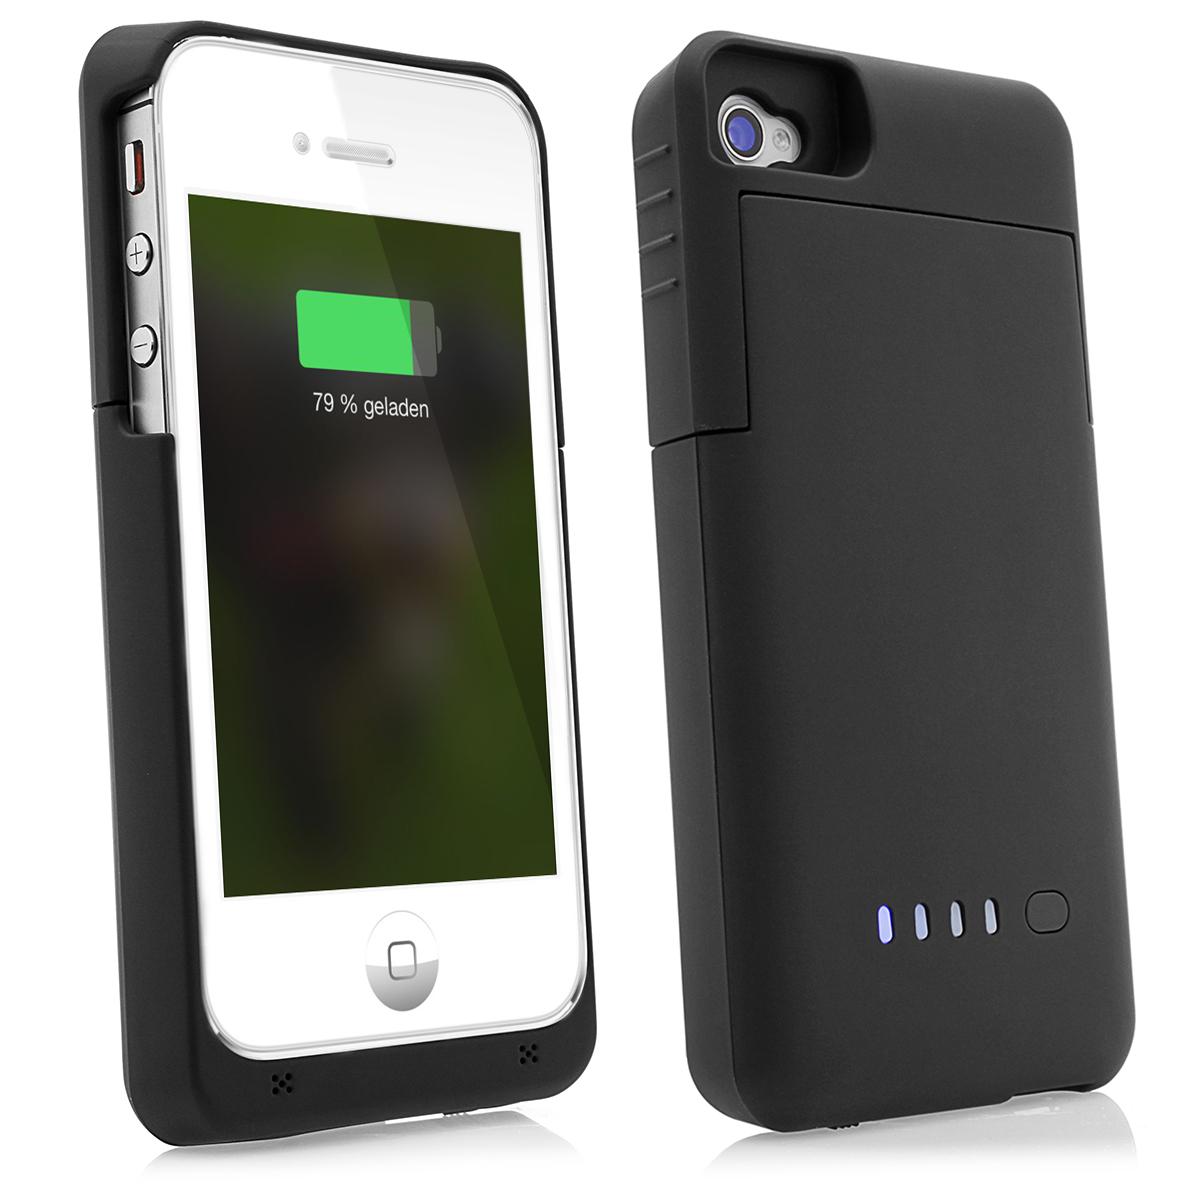 iPhone-4-4S-Power-Case-Akku-Li-Polymer-Cover-mit-1900mAh-Zusatzakku-schwarz